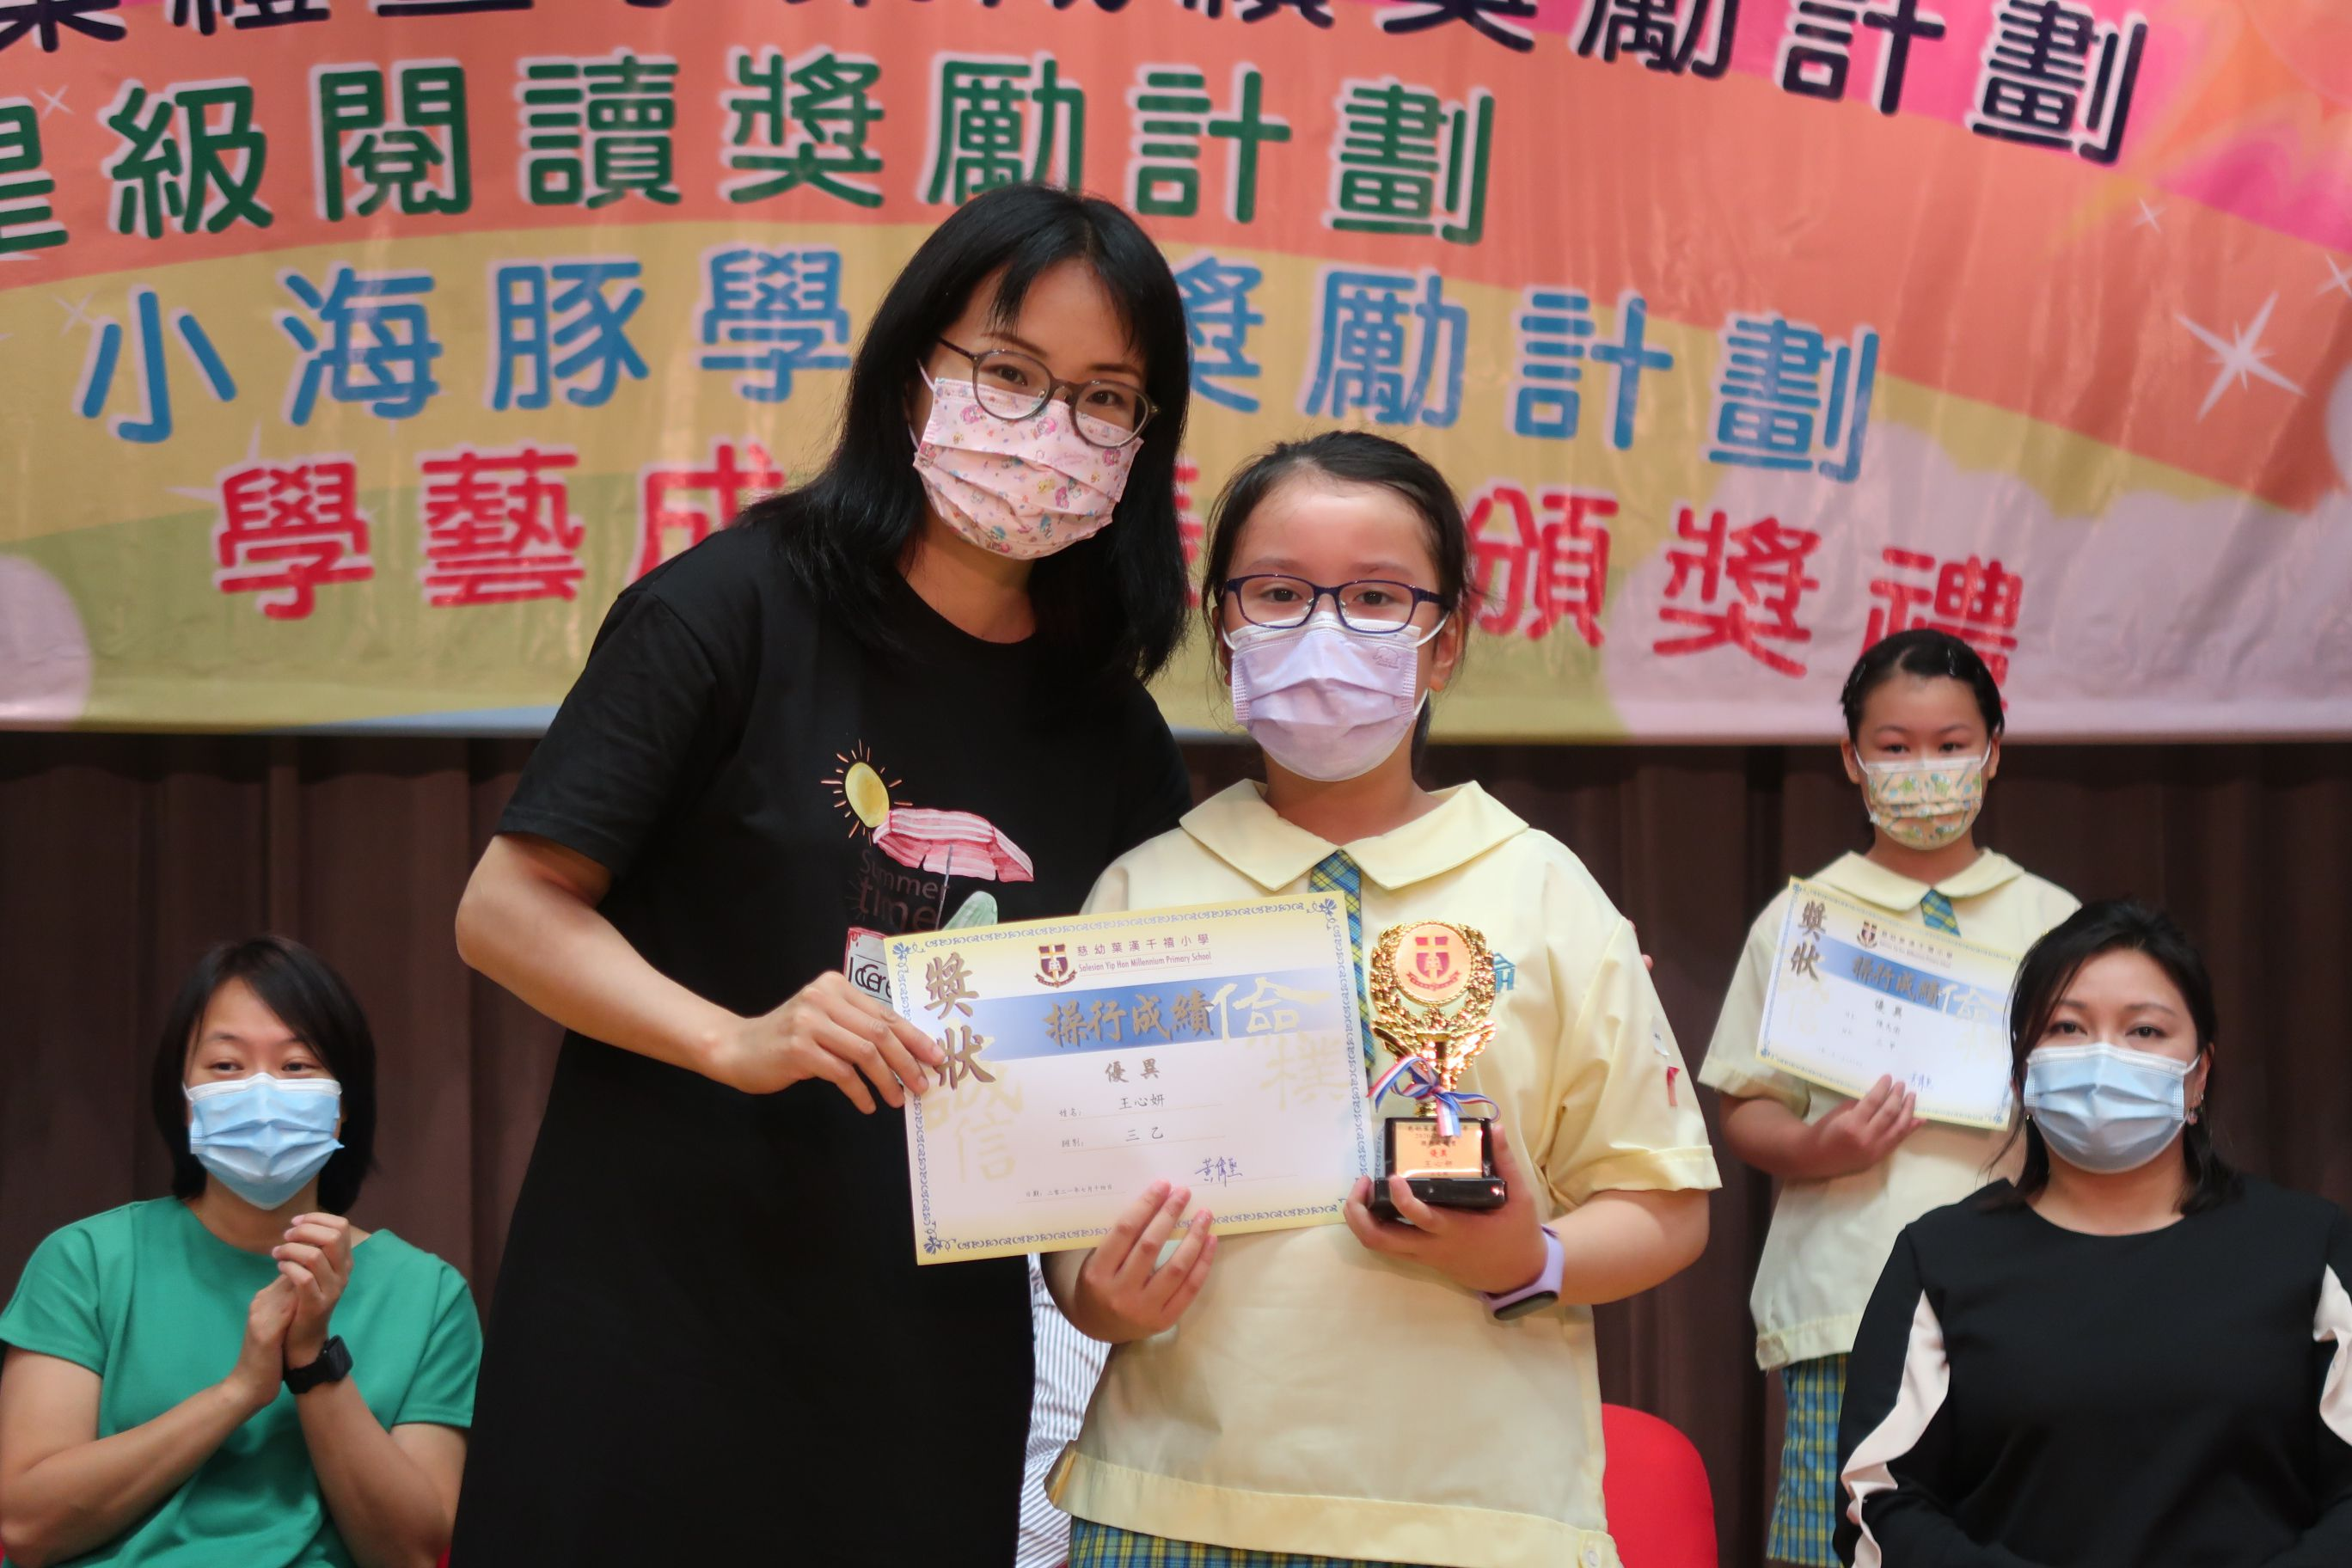 https://syh.edu.hk/sites/default/files/img_5487.jpg